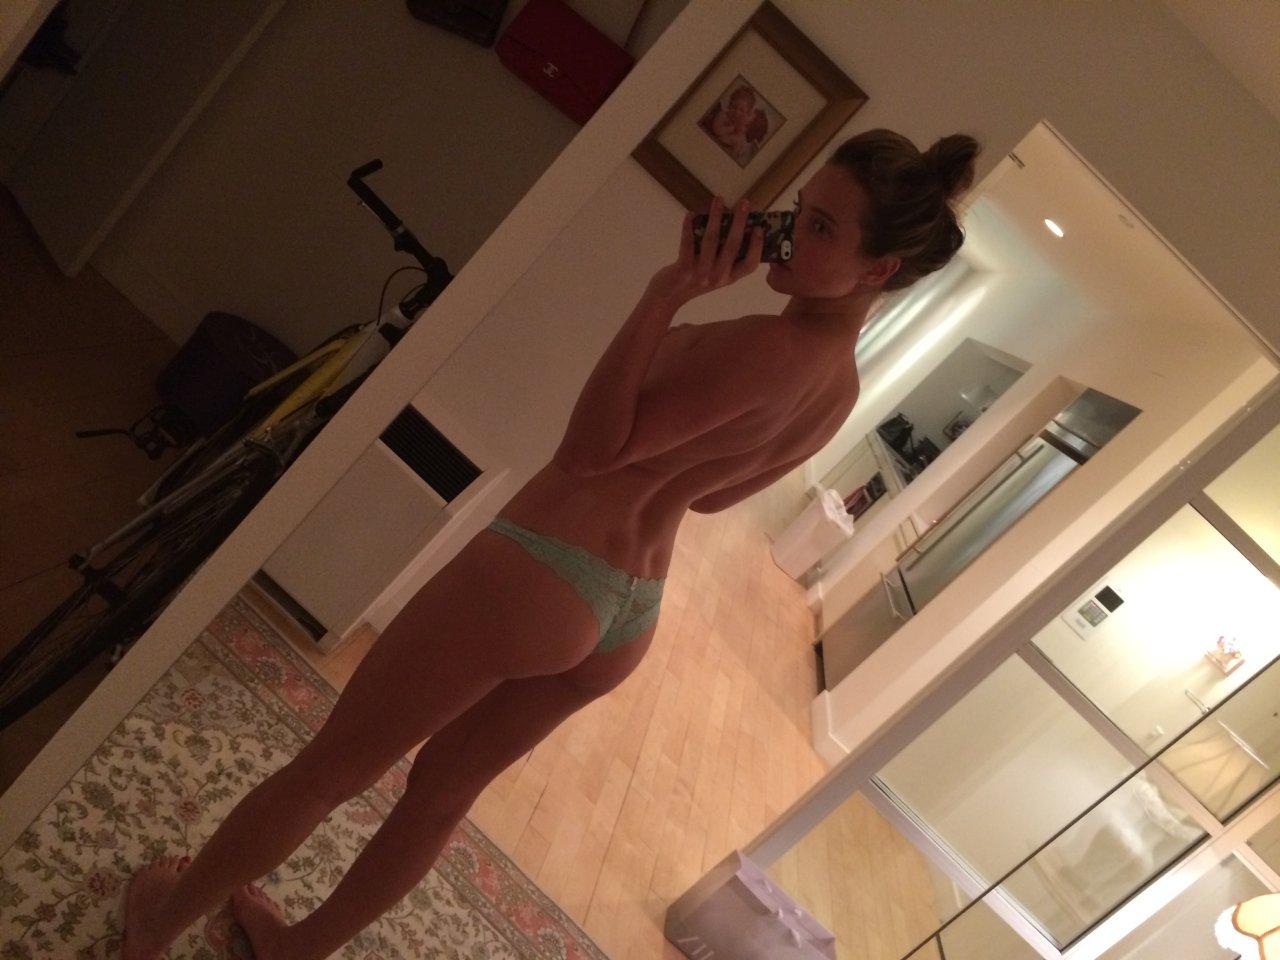 pussy Hannah davis nude